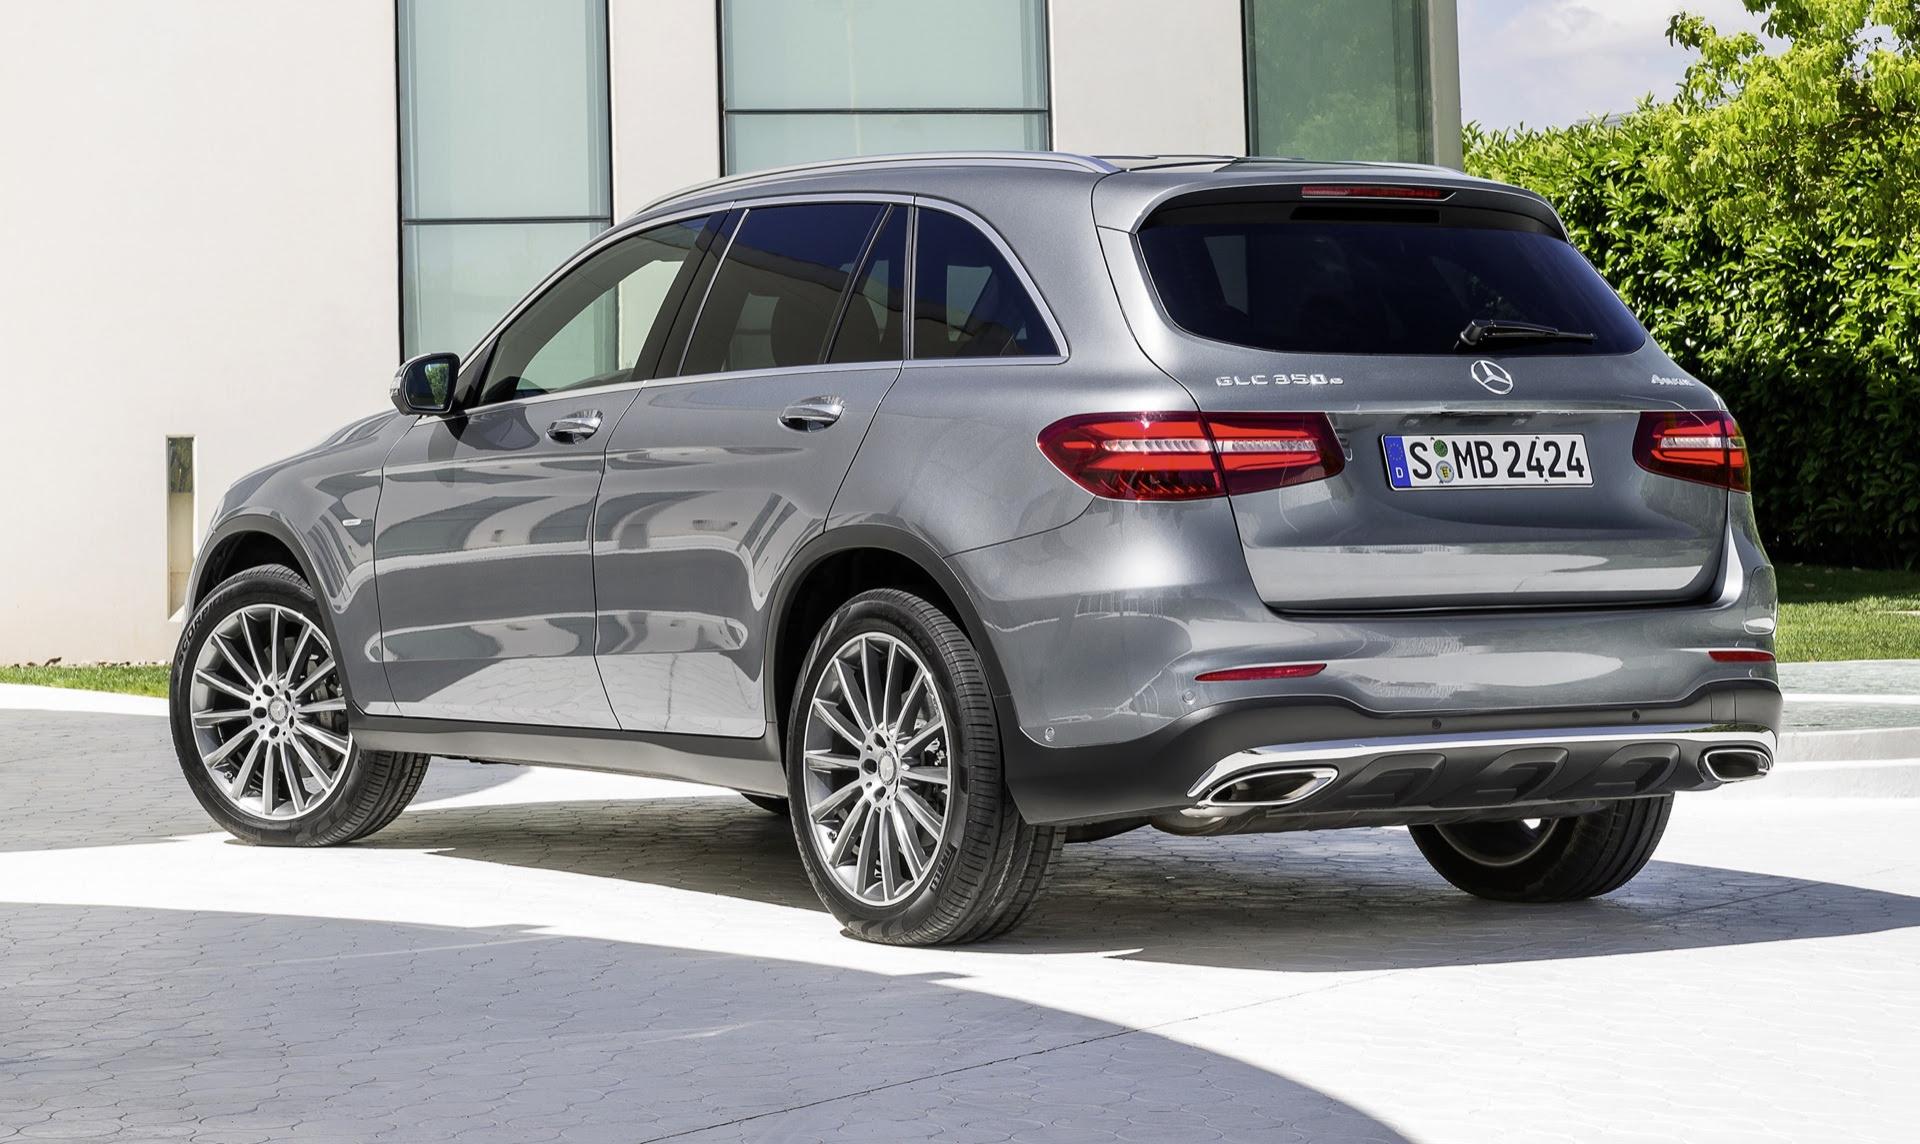 New Mercedes GLC SUV